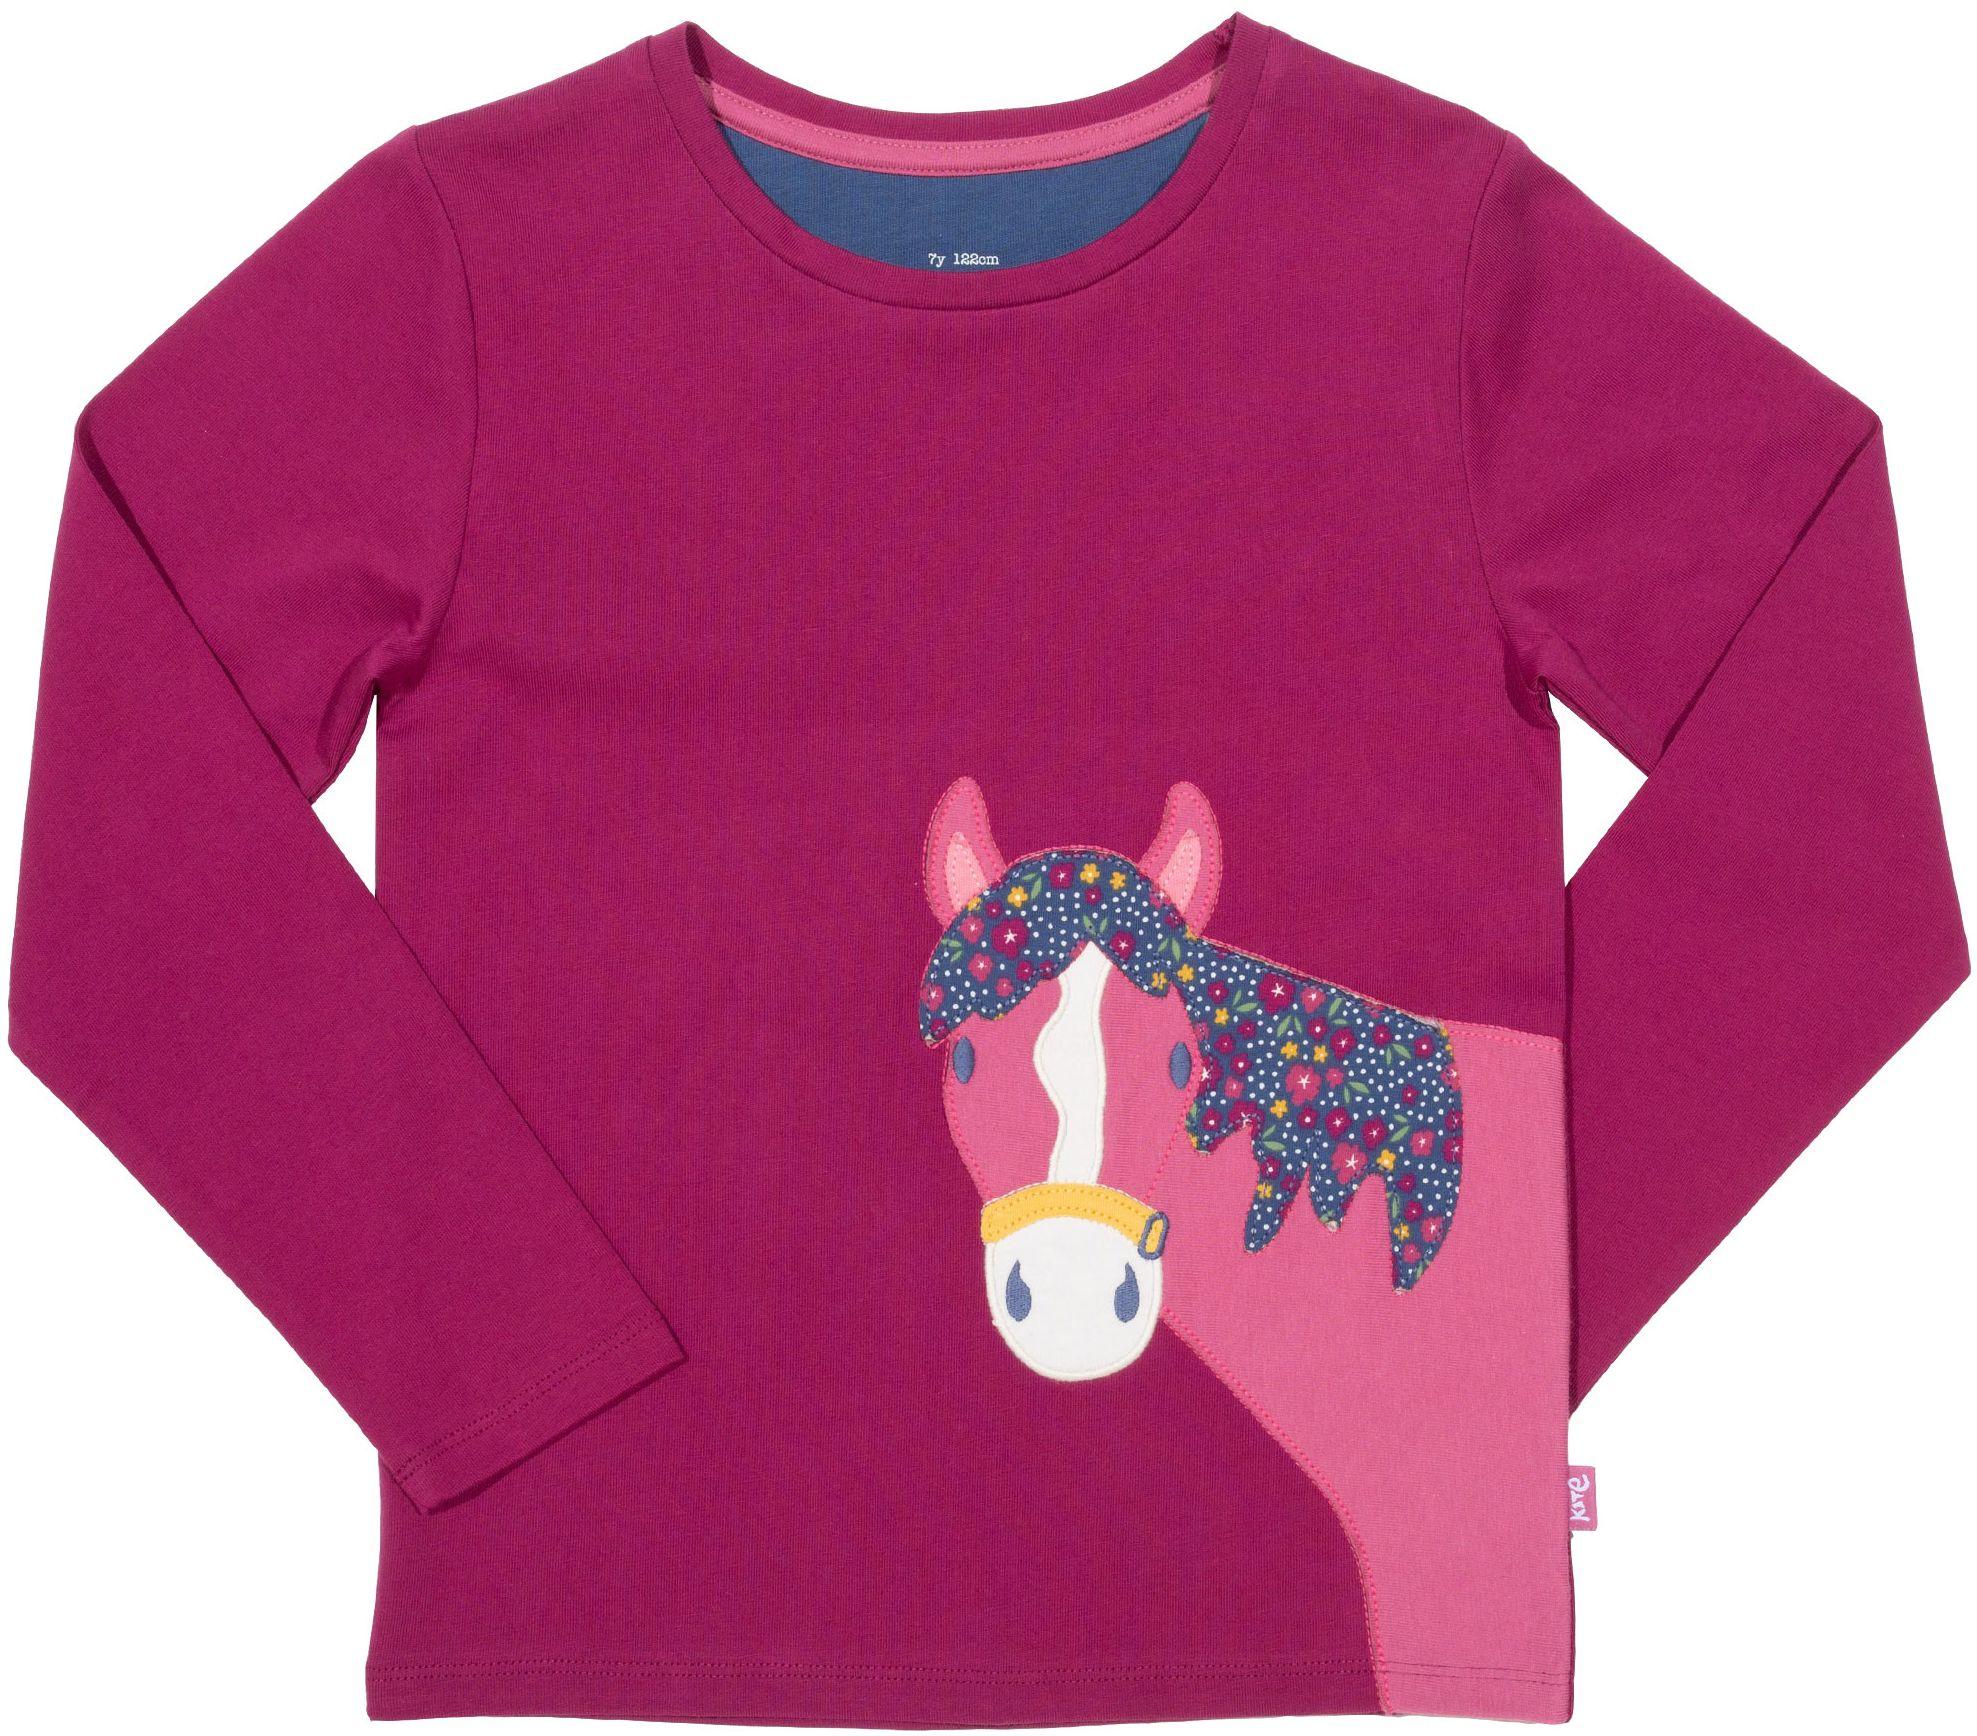 Kinder-Longsleeve mit Pferde-Applikation